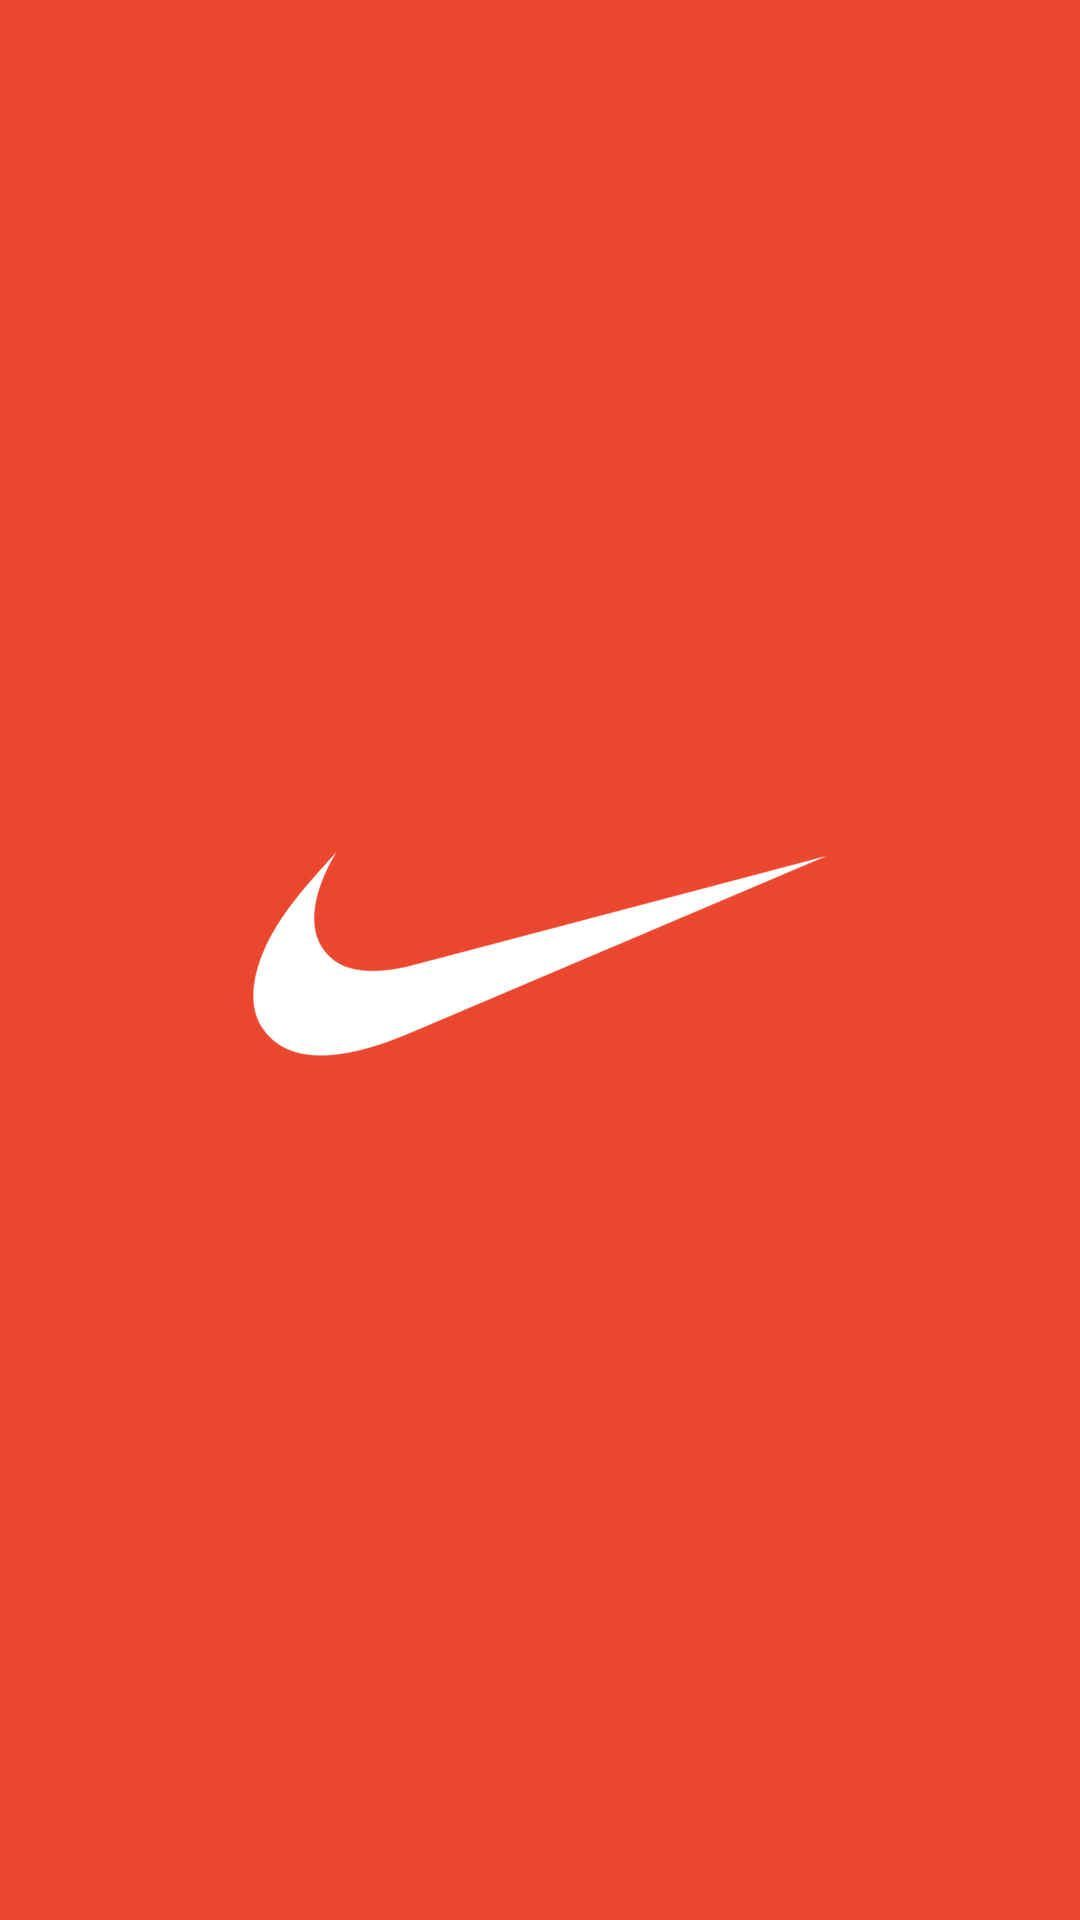 Nike Red Wallpaper Nike Wallpaper Nike Logo Wallpapers Nike Wallpaper Iphone